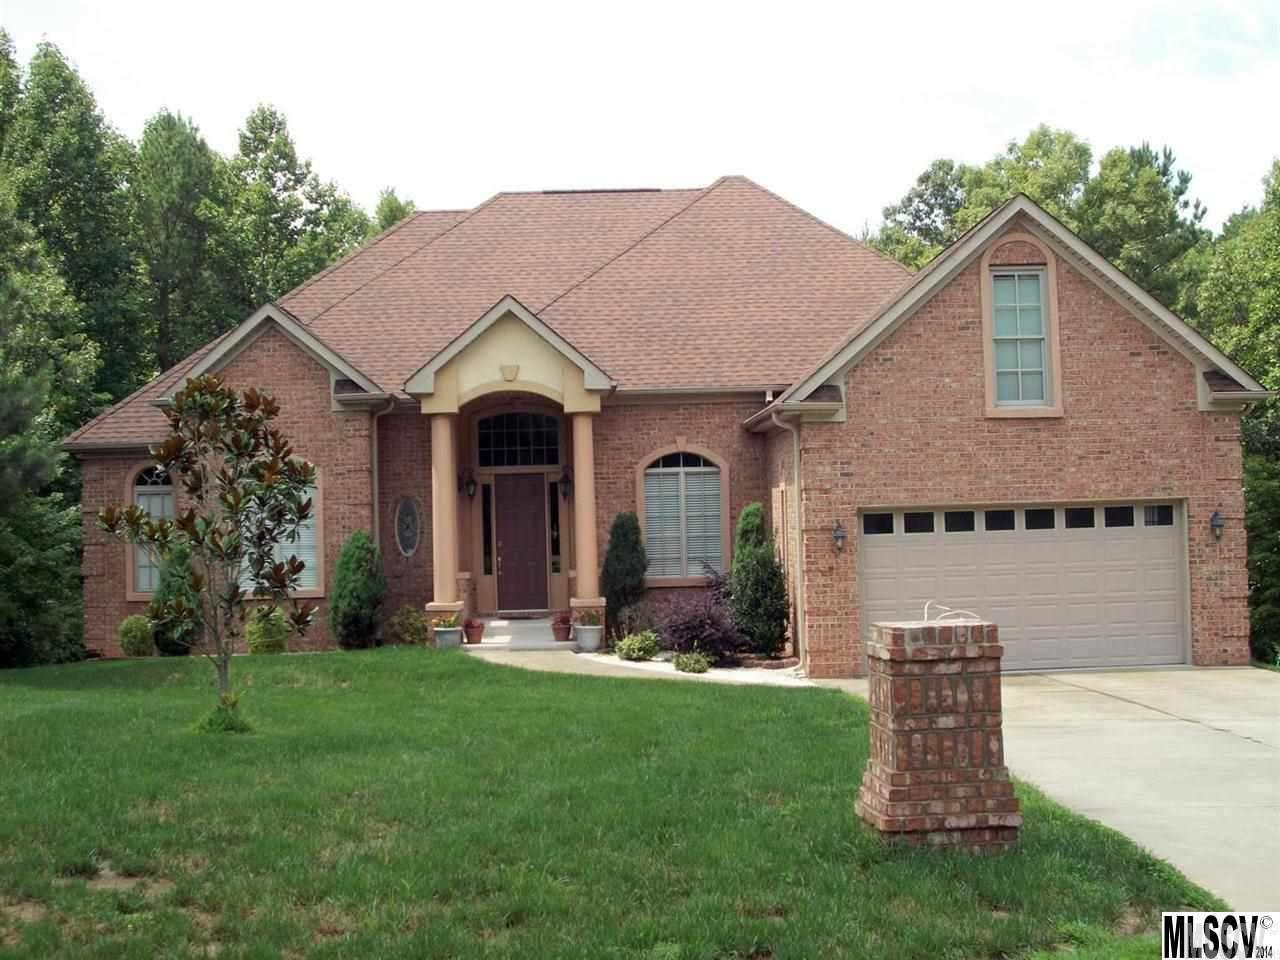 Real Estate for Sale, ListingId: 35490553, Granite Falls,NC28630